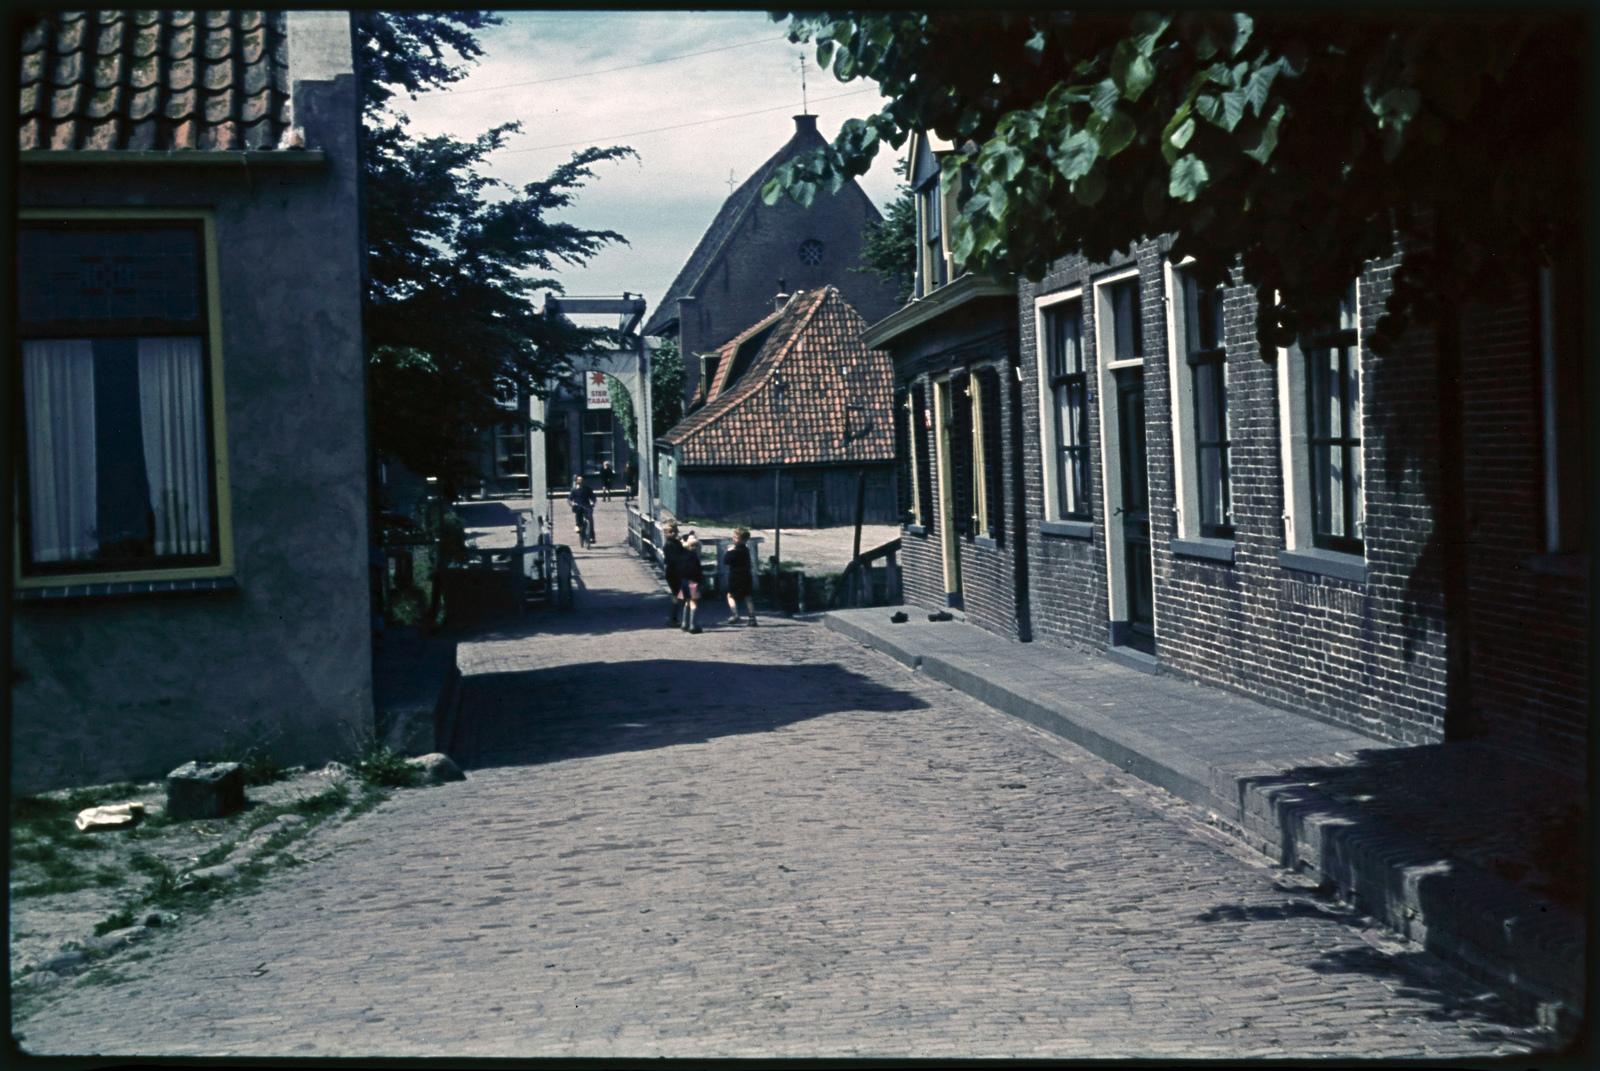 Straatbeeld in Blokzijl